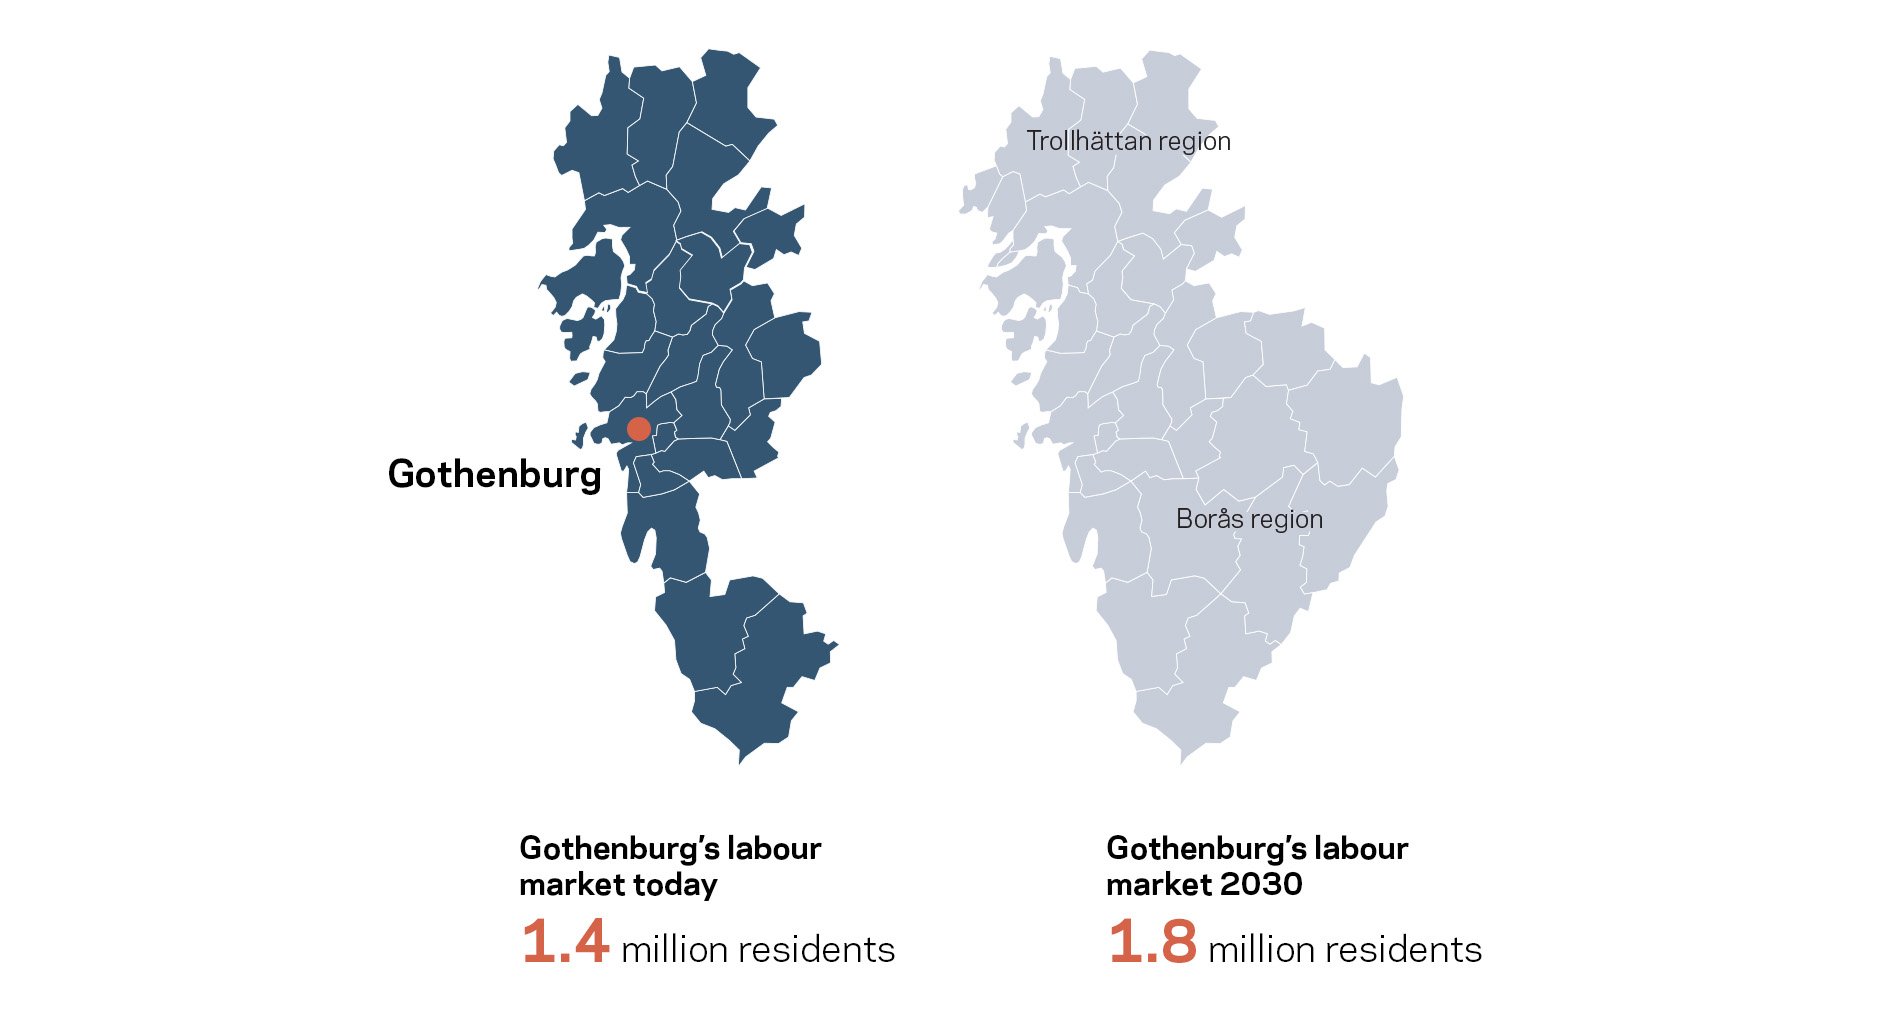 Illustration of Gothenburg's labour market